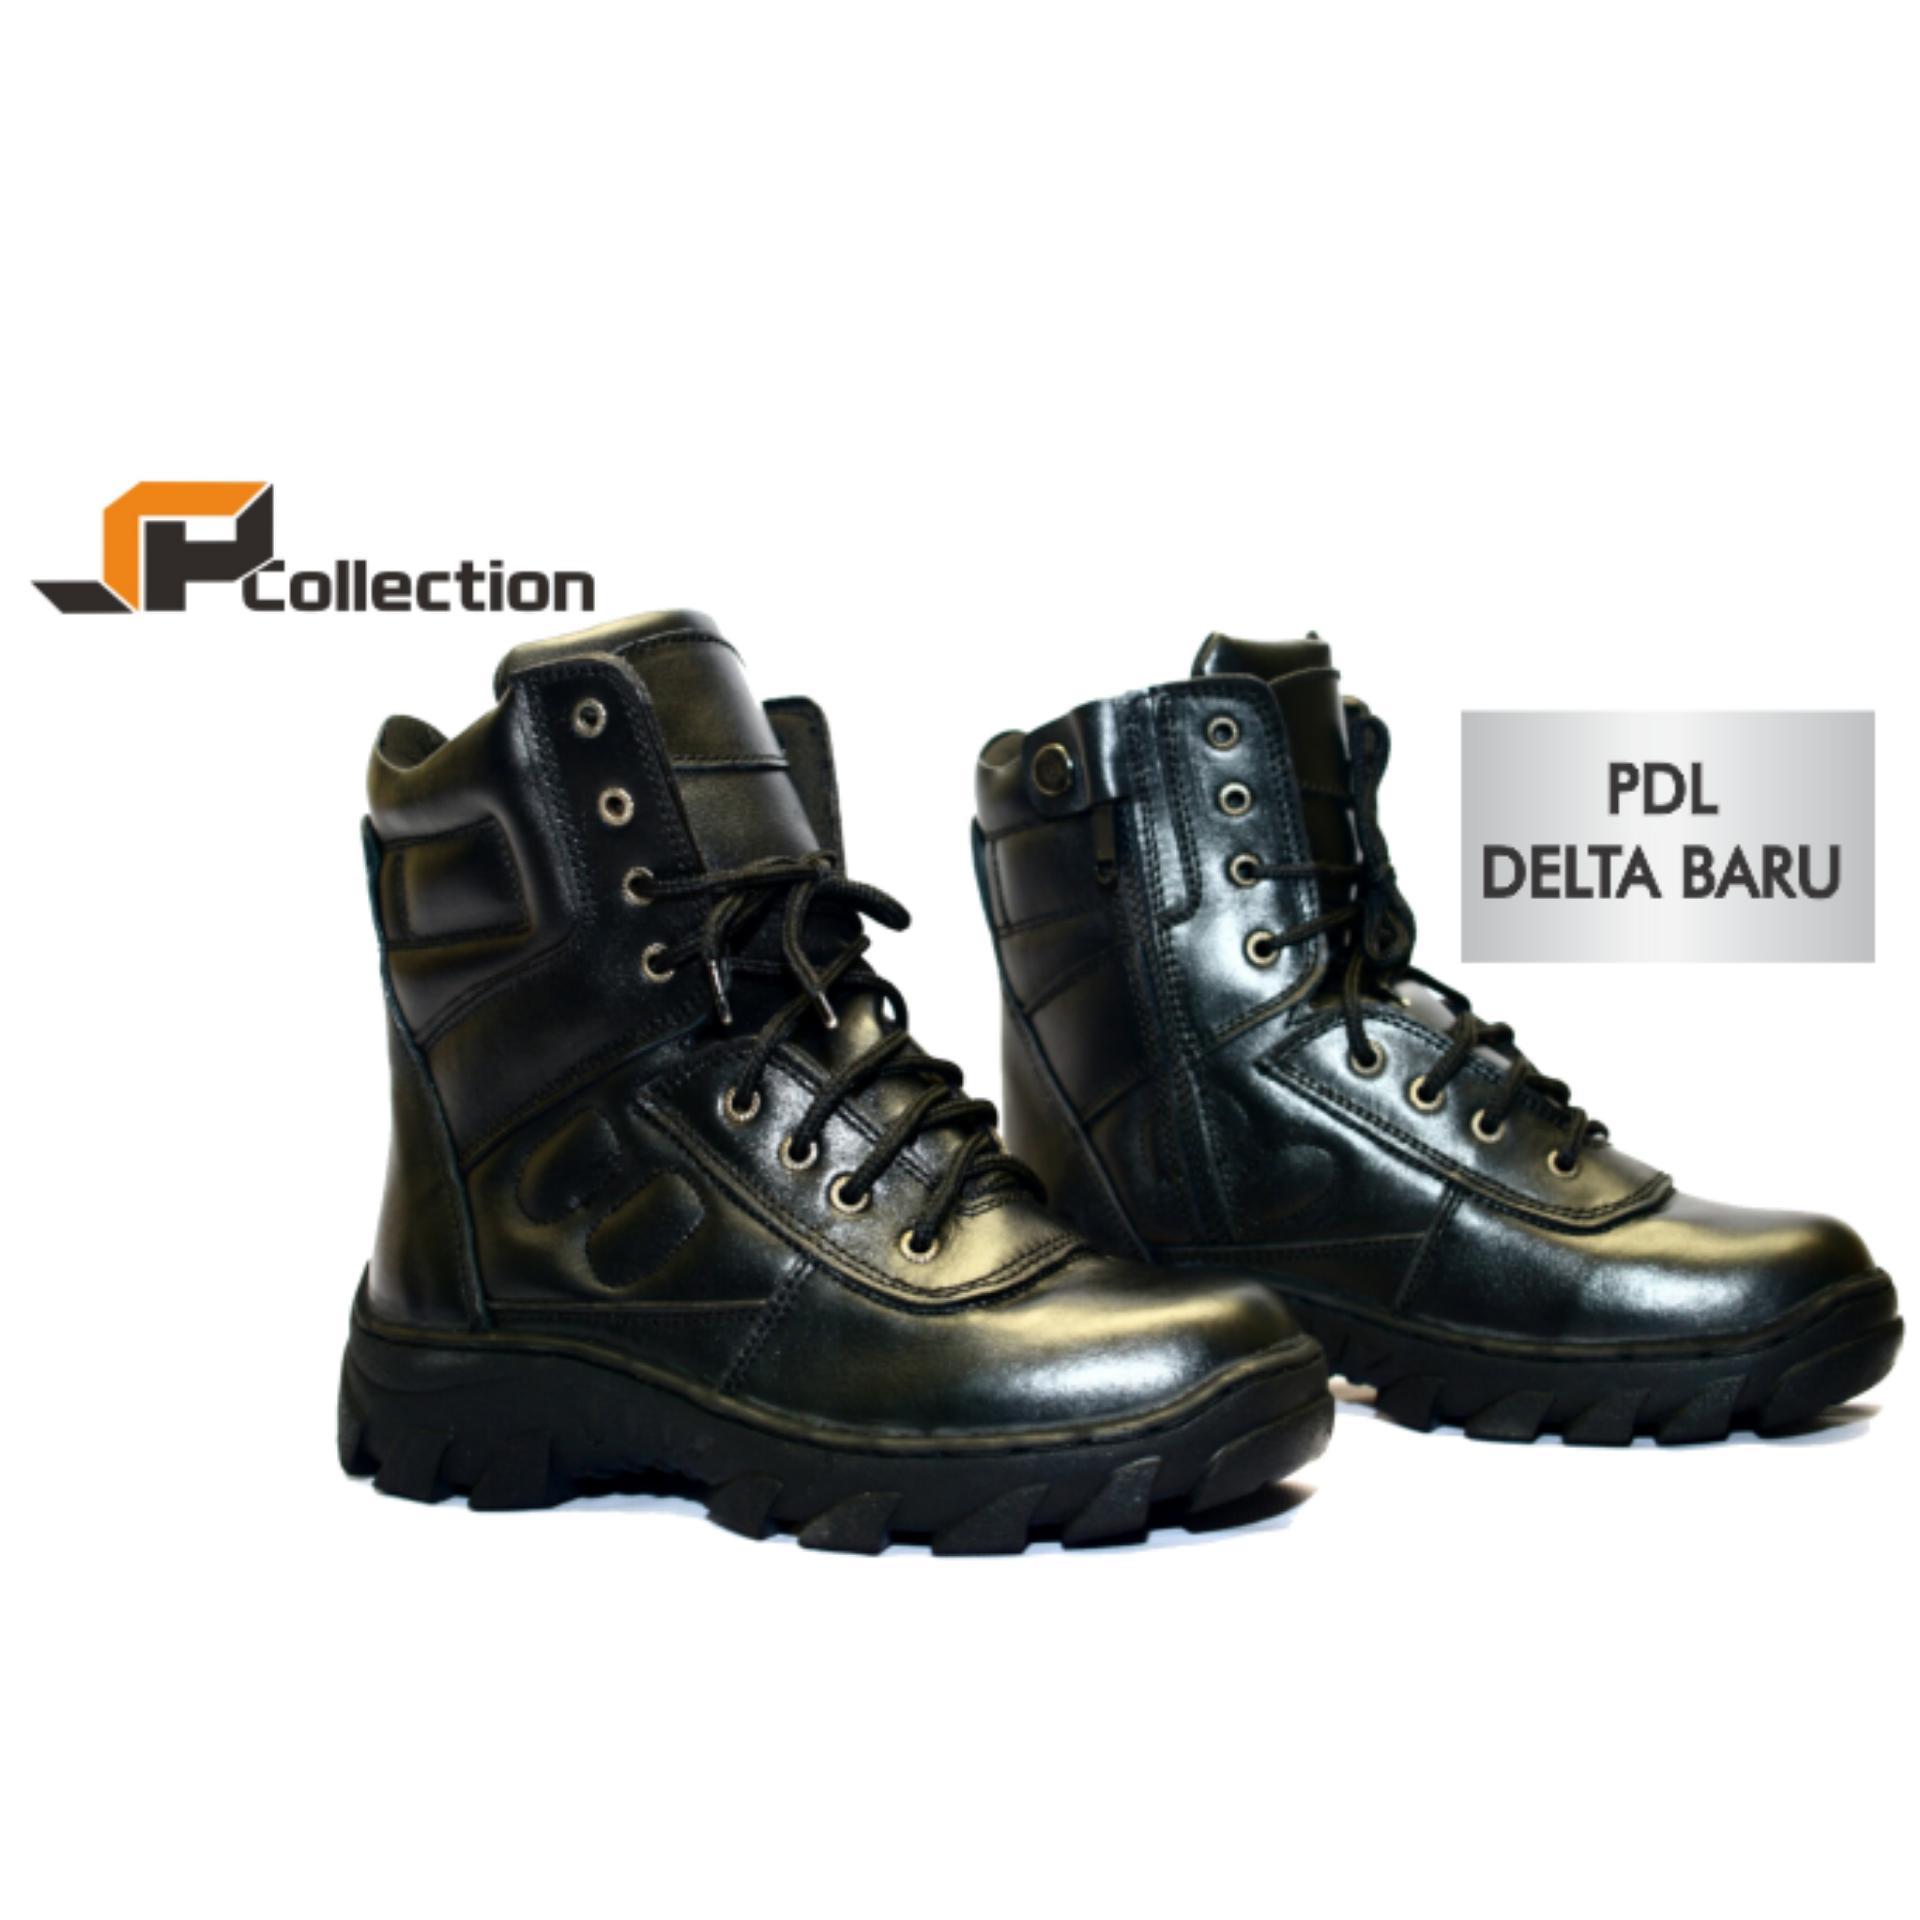 JAFERI Sepatu Boots PDL Delta Baru Warna Hitam Bahan Kulit Sapi Asli Cocok Untuk Dinas Lapangan, Untuk POLRI, TNI, Security, Damkar, Pertambangan, Cocok Untuk Biker, Touring, Hiking, Travelling, Dll